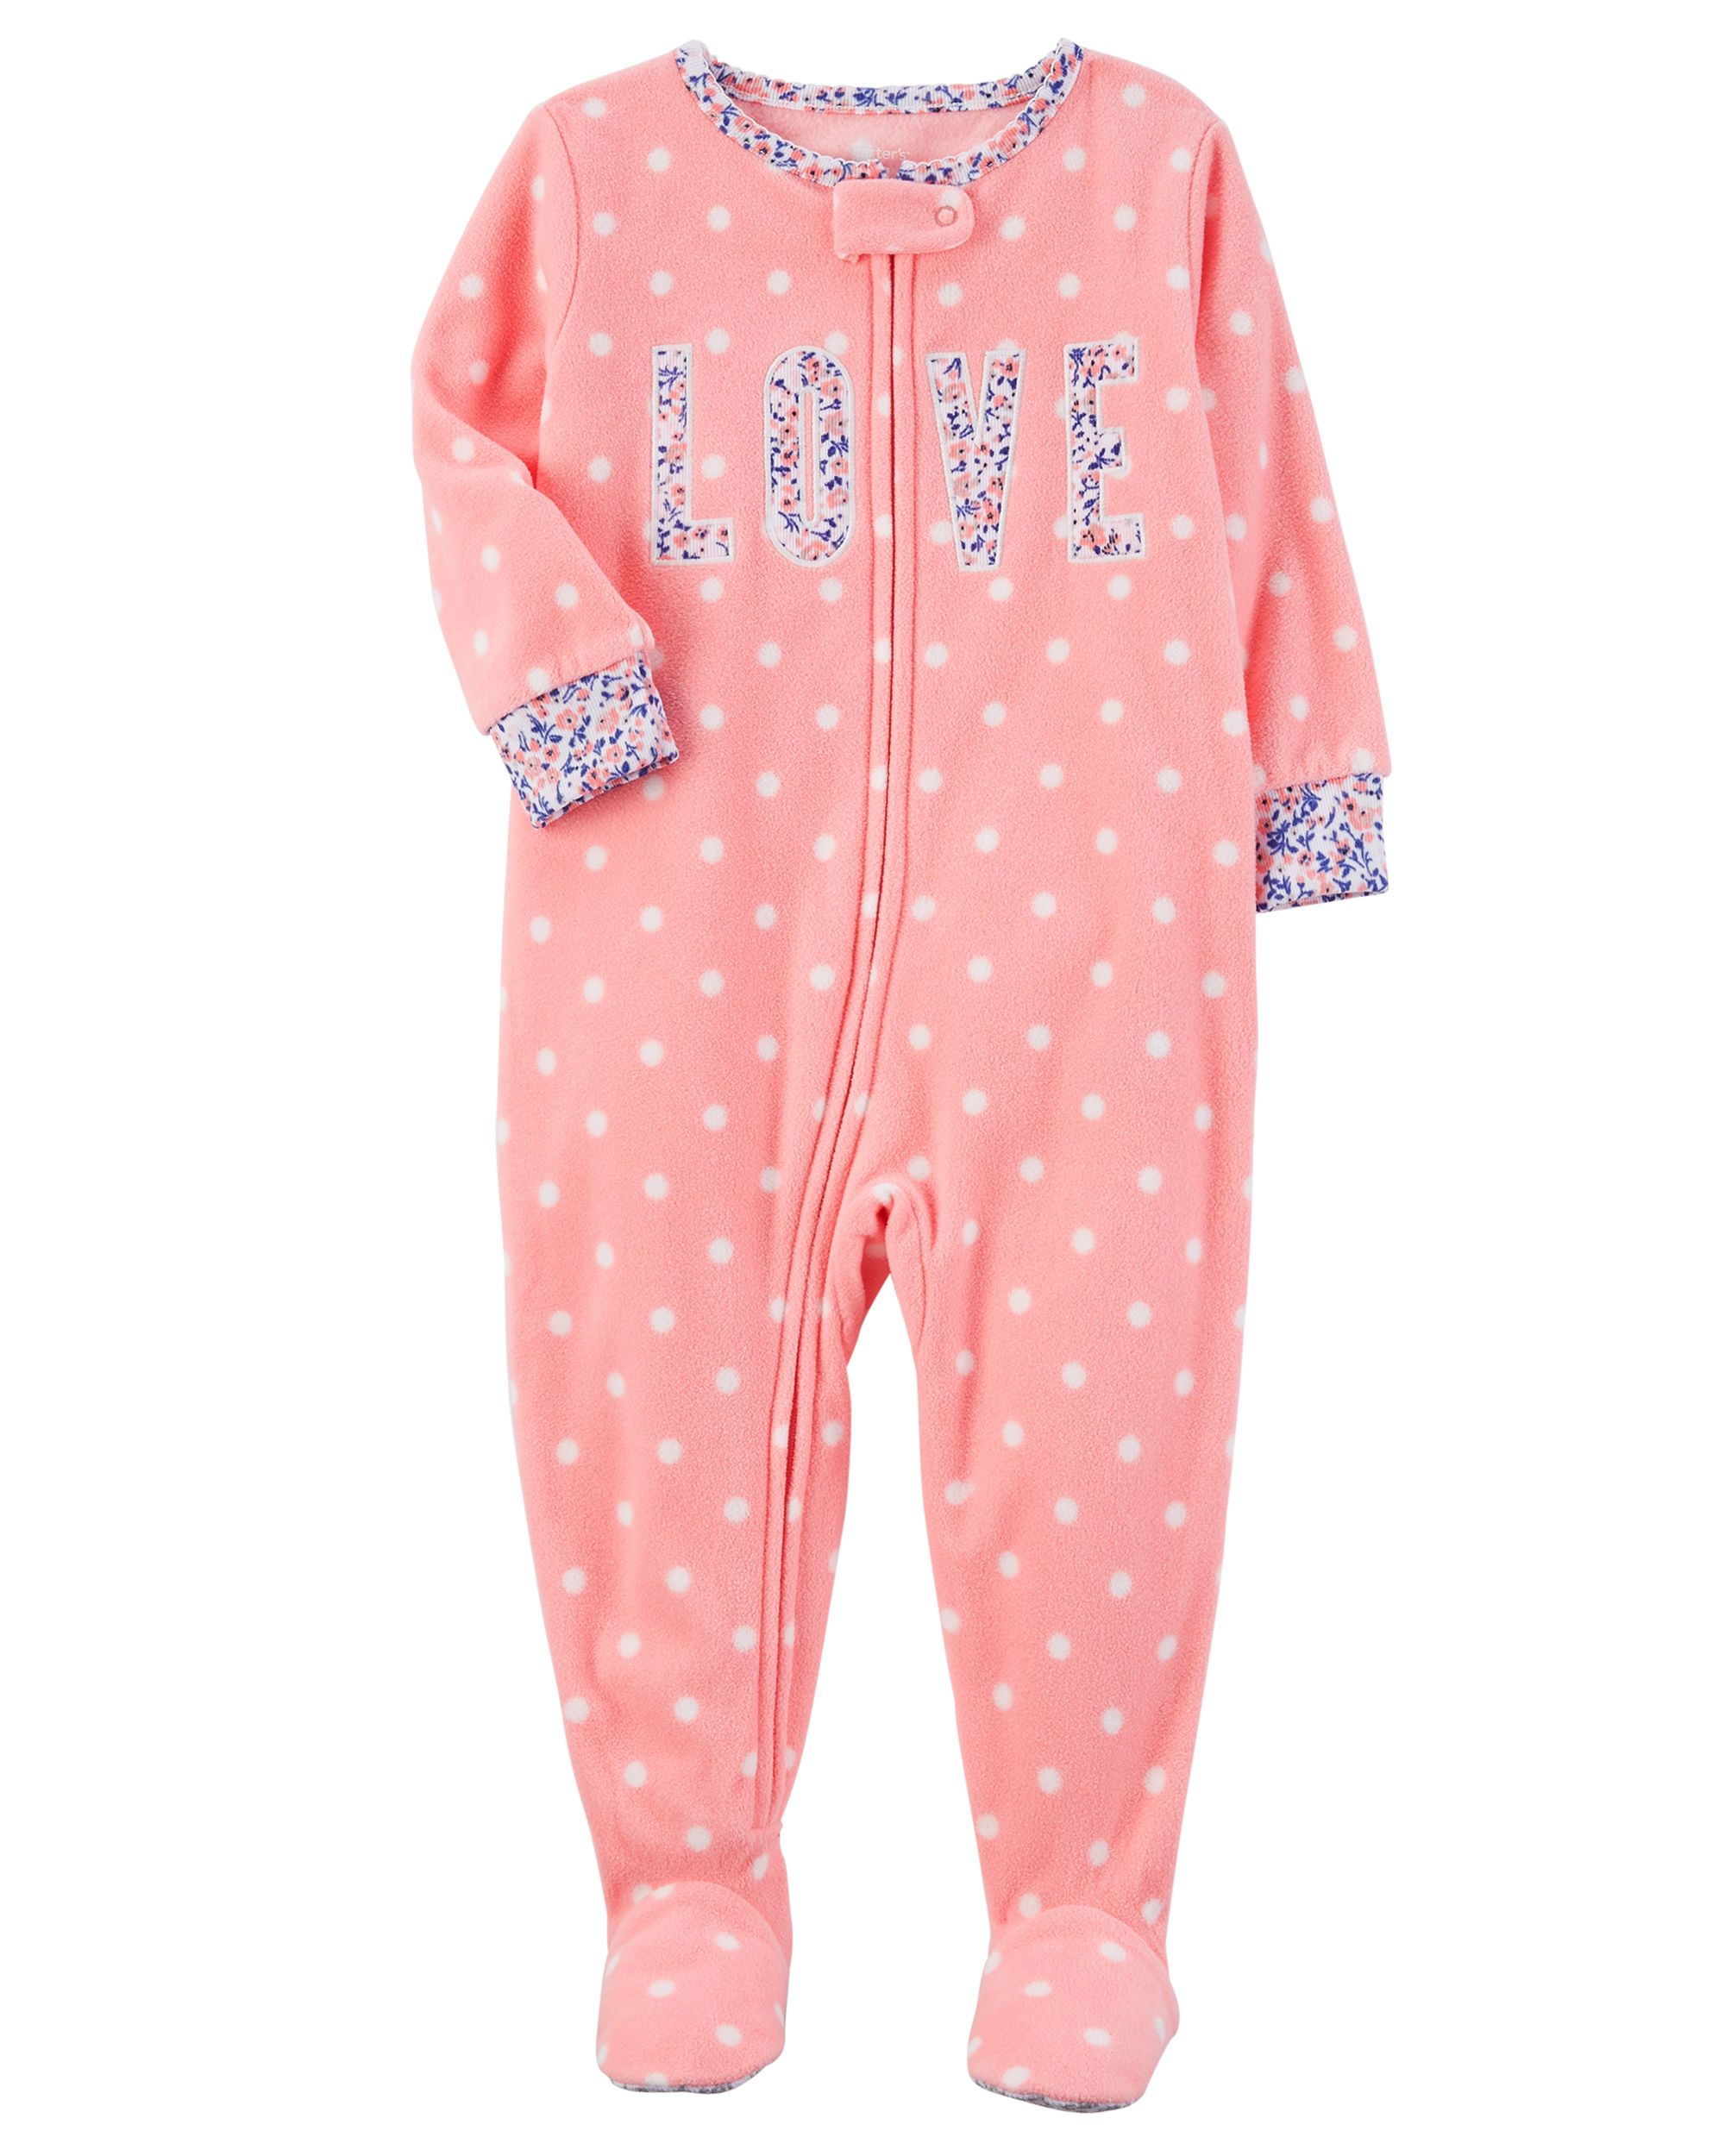 girl piece plush onepiece bebe one sleepers carters soft baby sleeper bon months p s